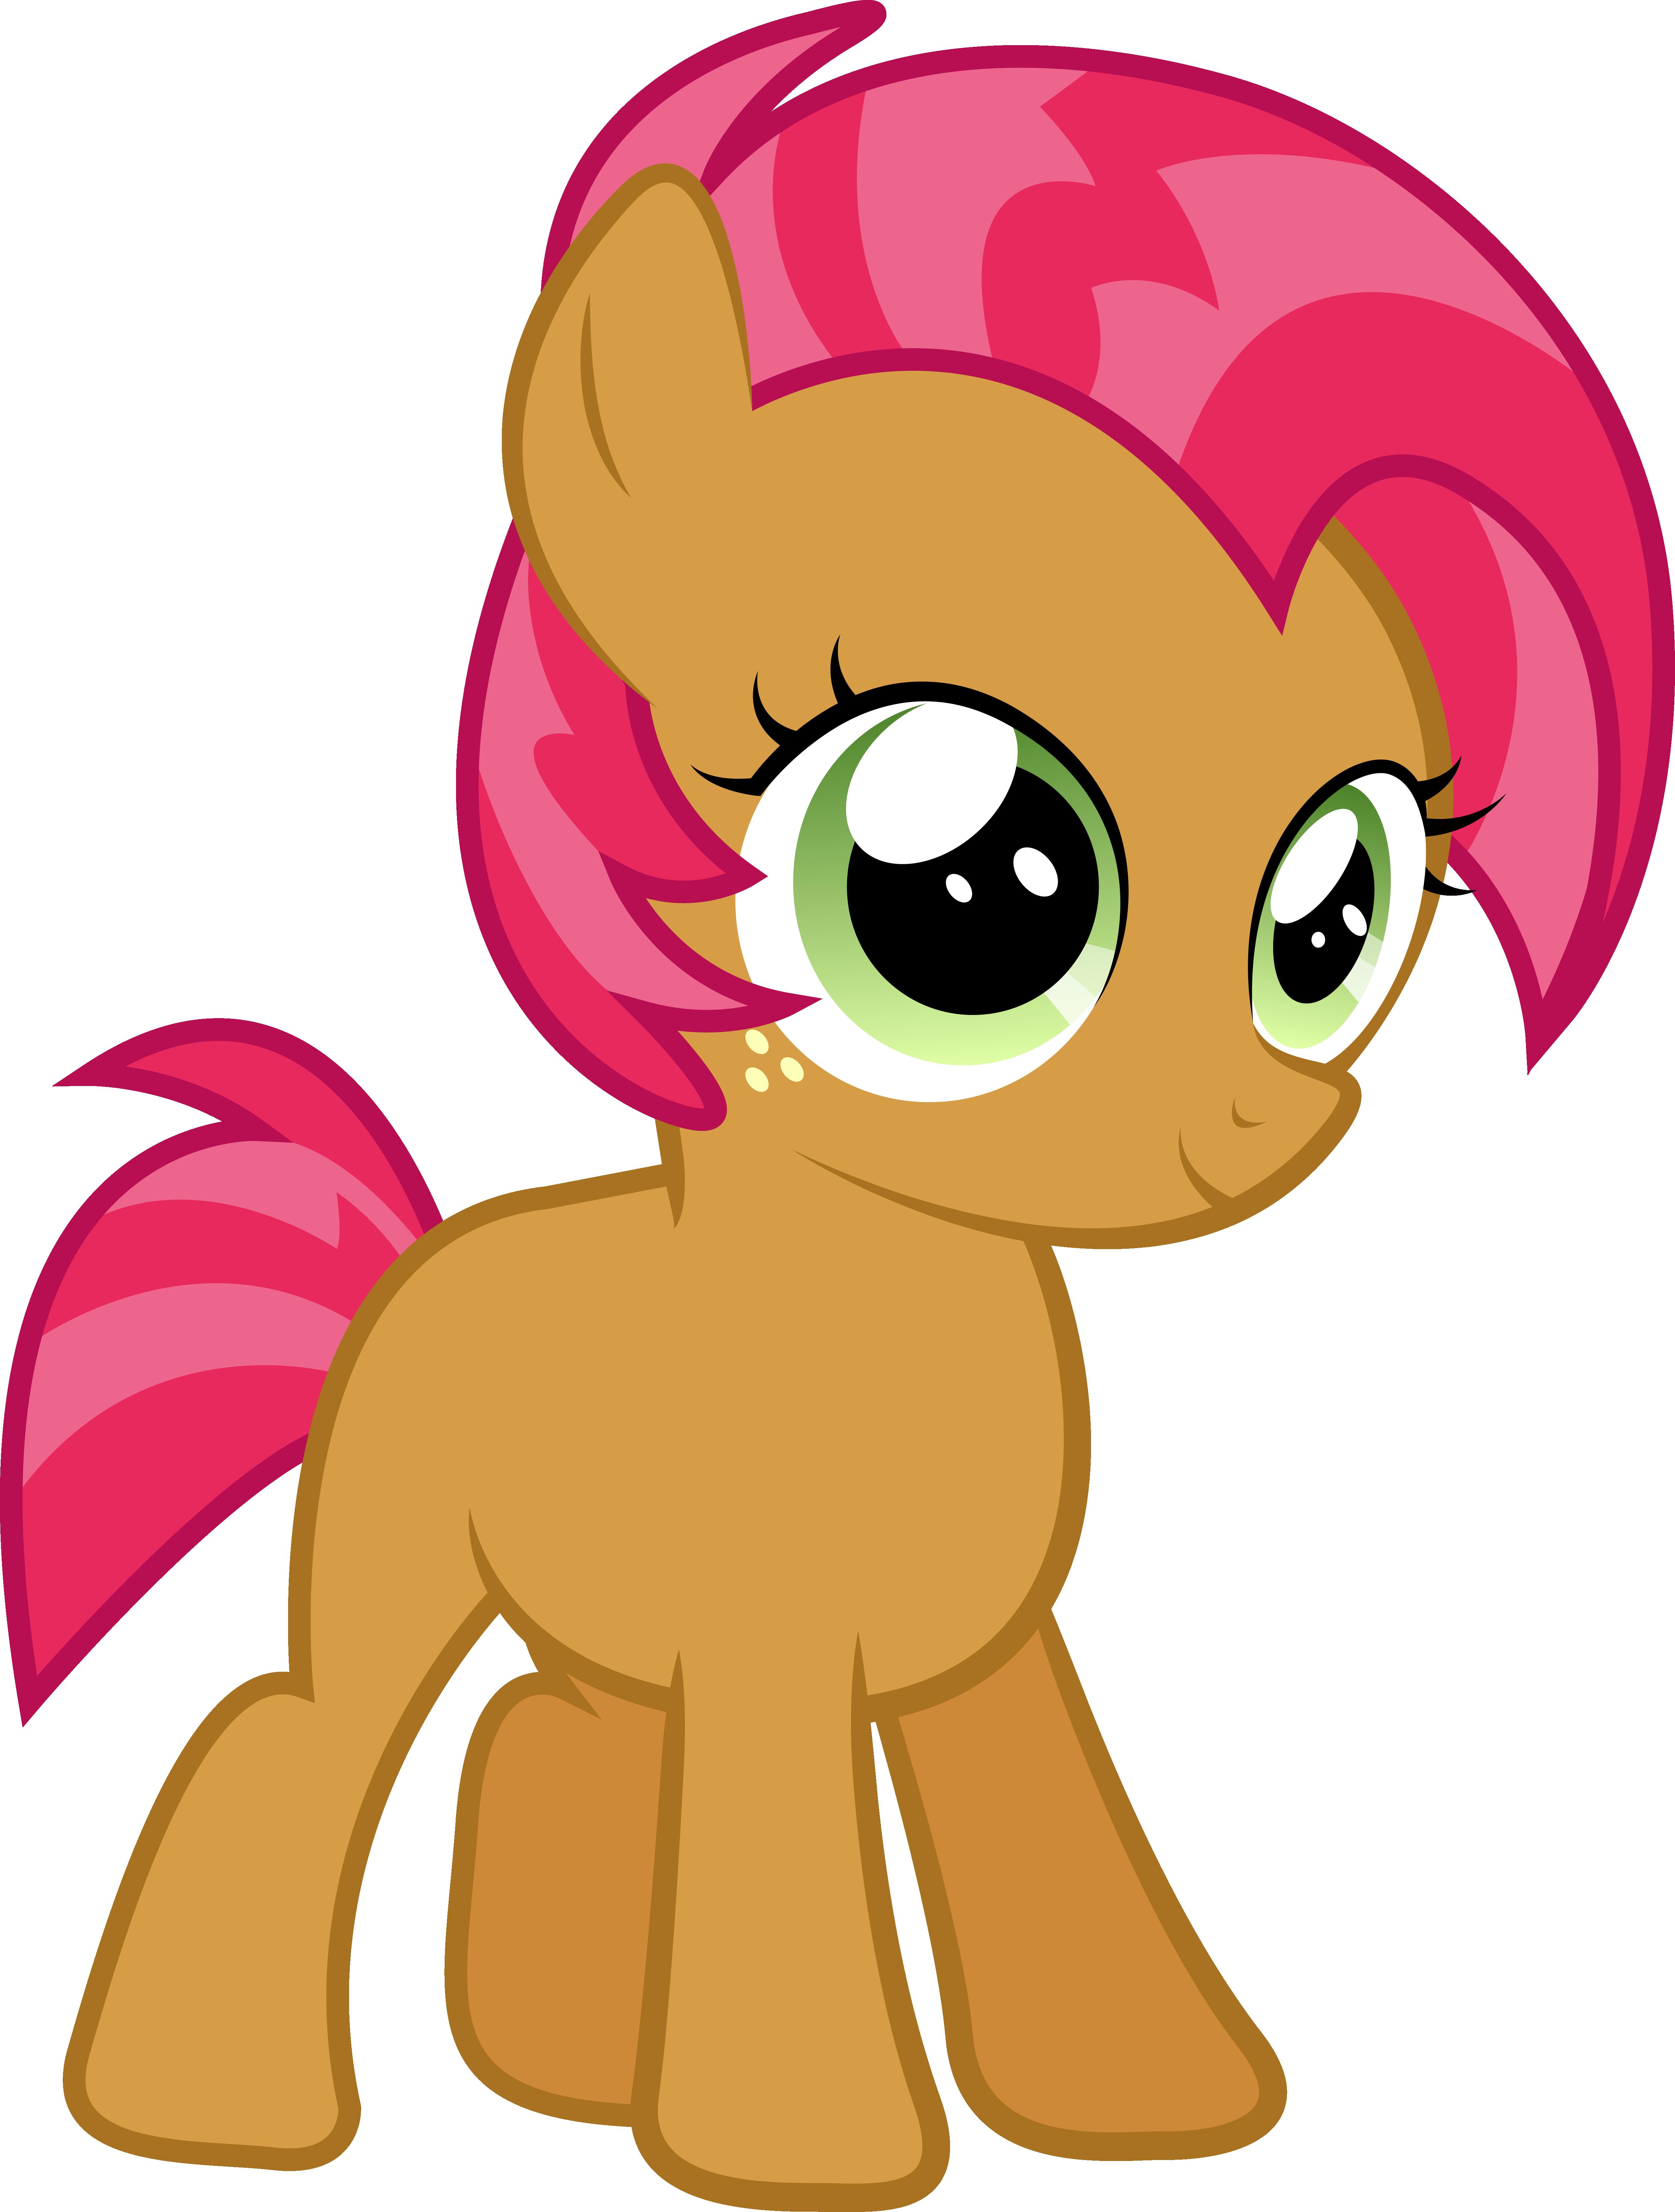 Babs Seed- Red Orange   CMC   Mlp pony, My little pony ...